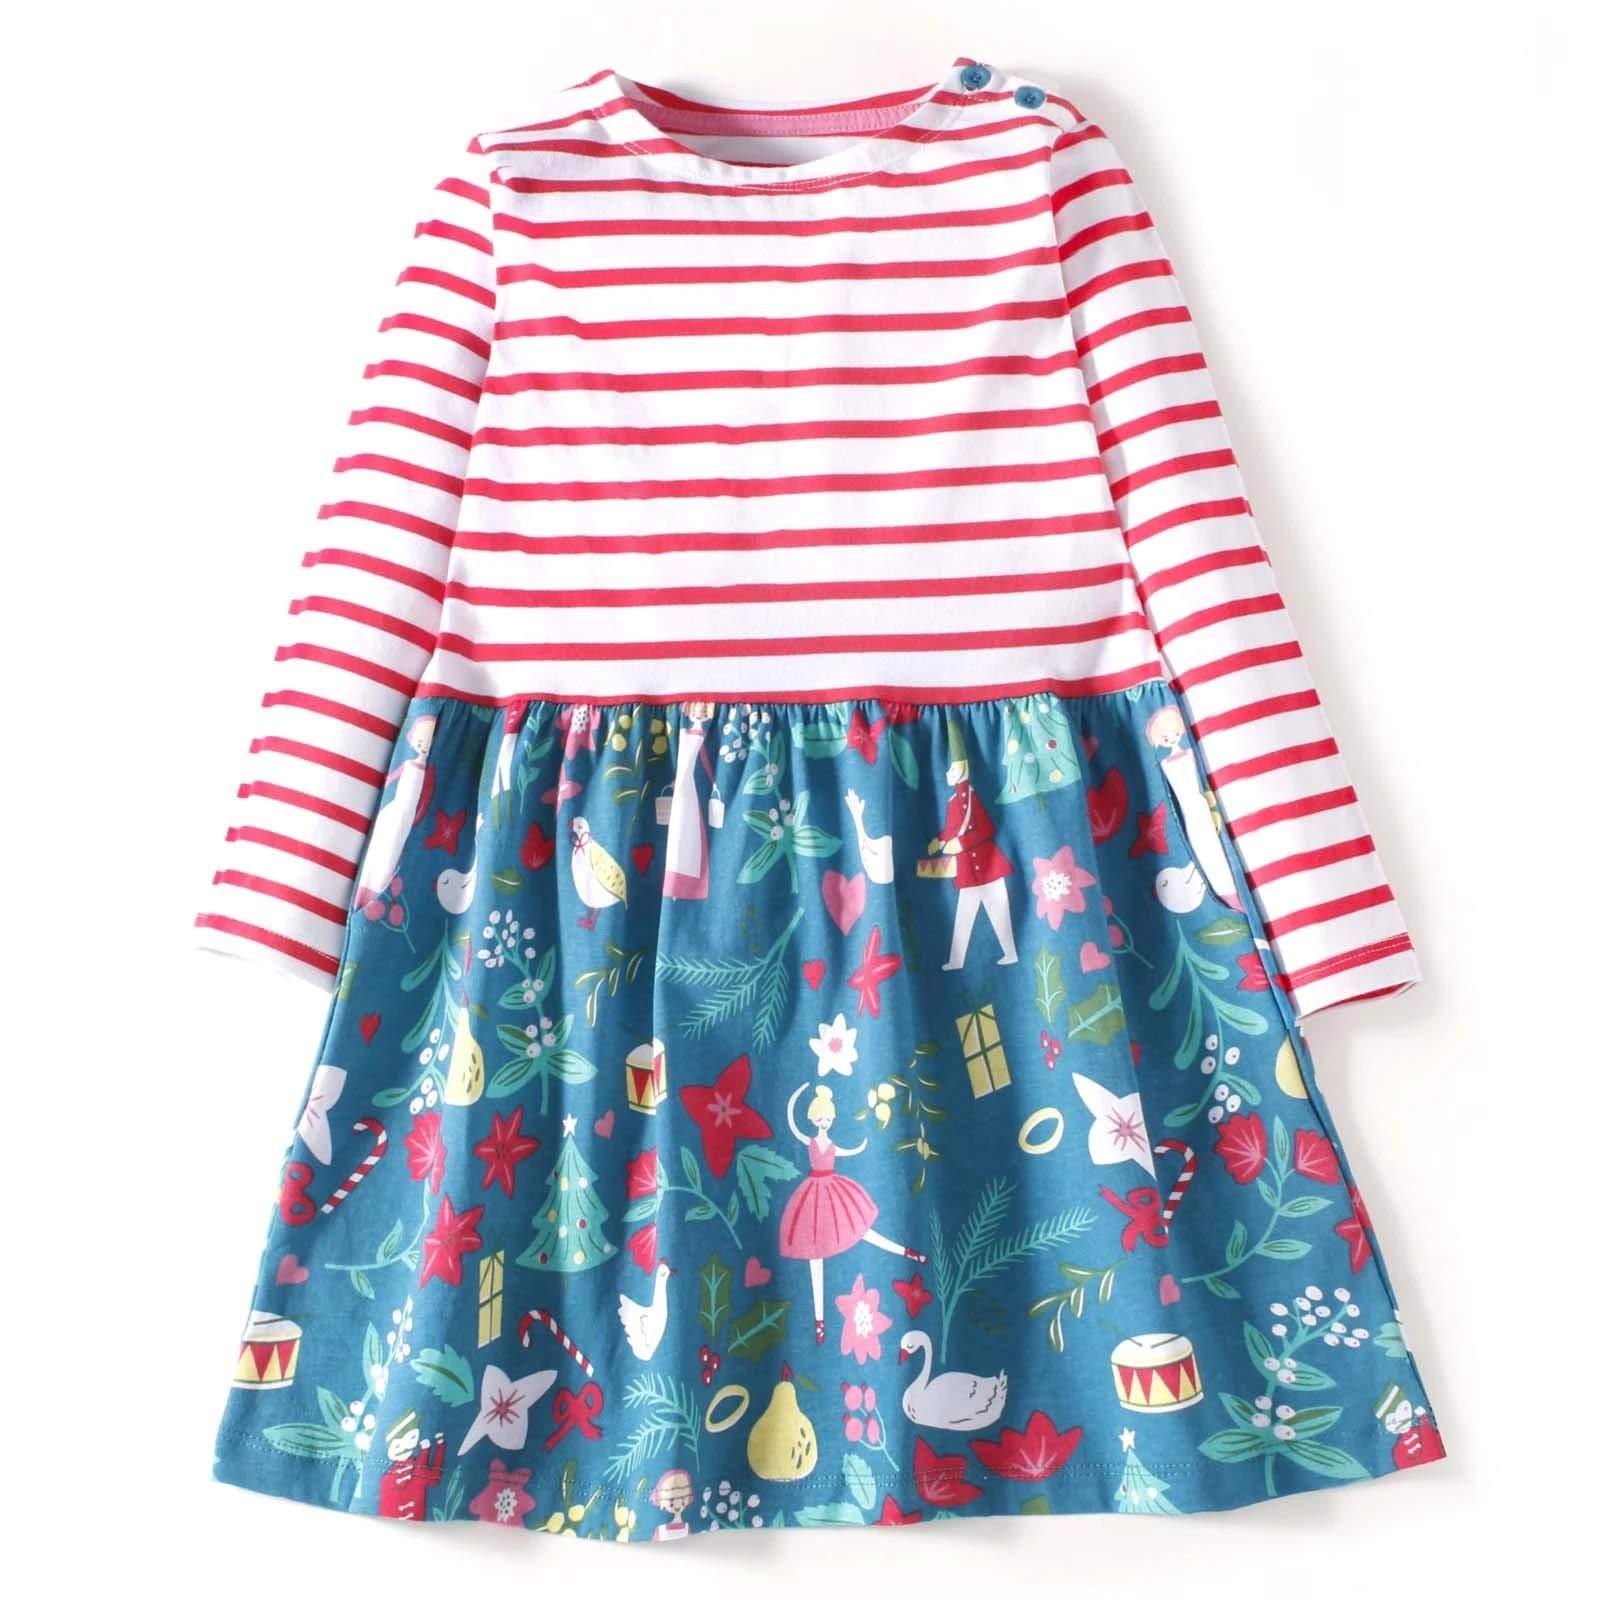 Mrsrui Little Girls Cotton Dress Short Sleeves Casual Summer Striped Printed Shirt Pink by Mrsrui